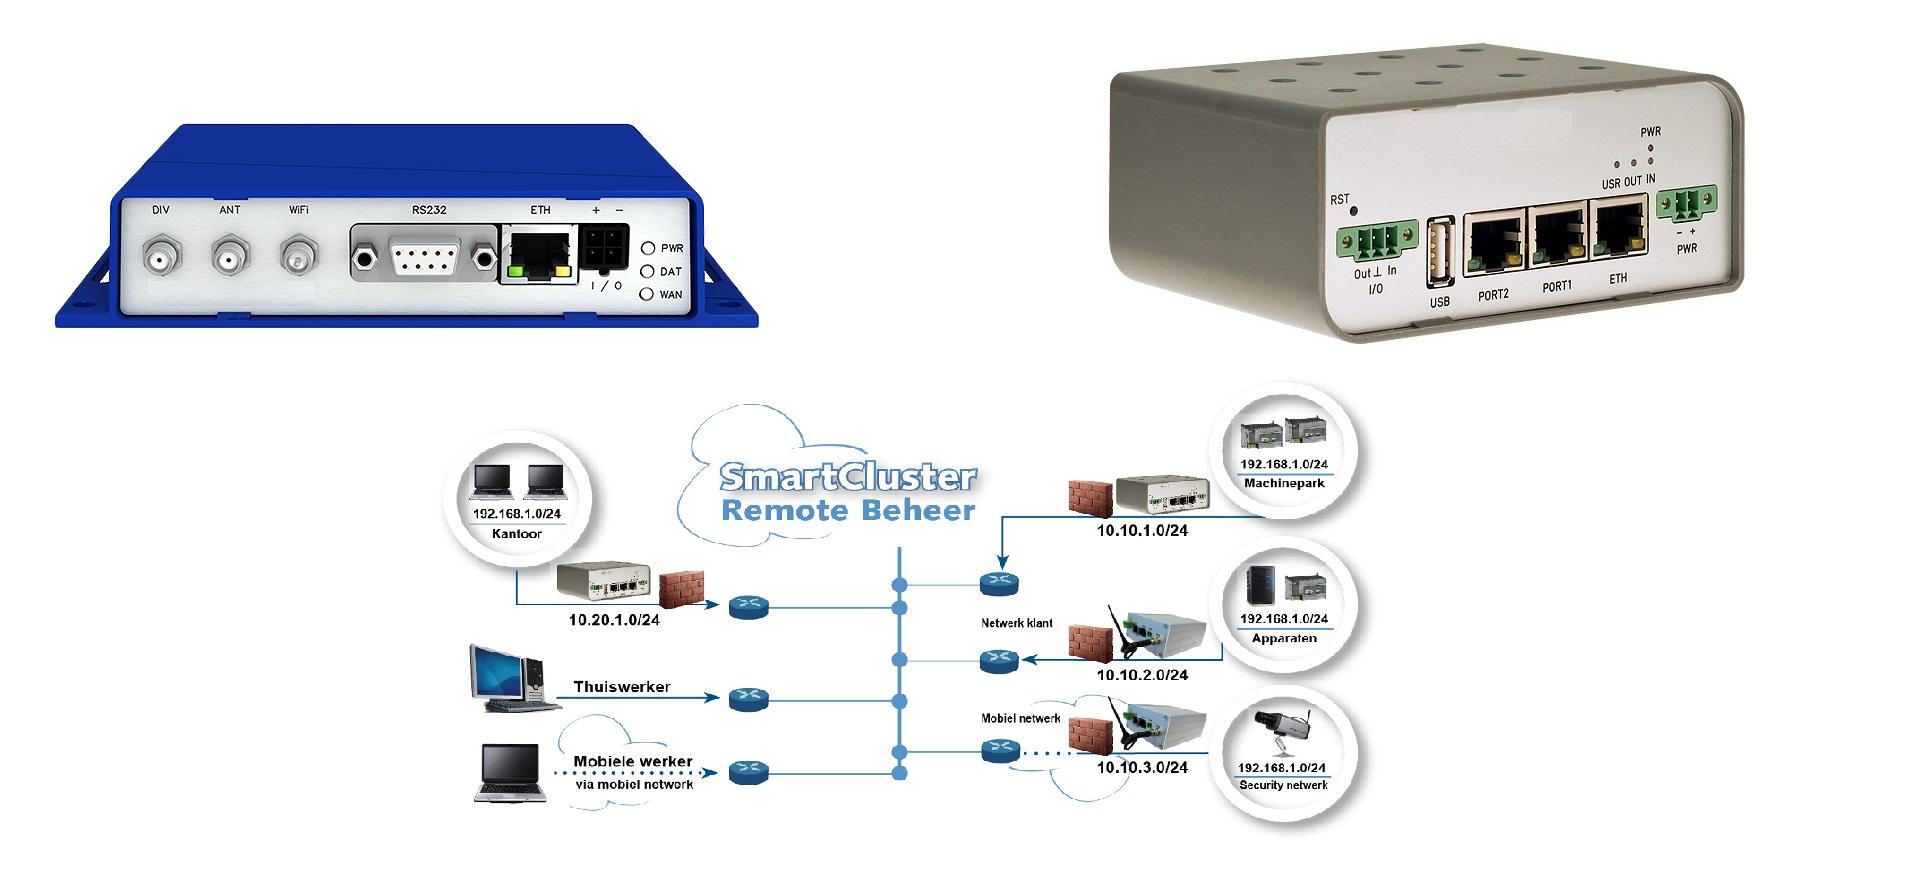 MCS Modem Emulator 4G - Starters Pack | MCS Modem Emulator | Product | MCS